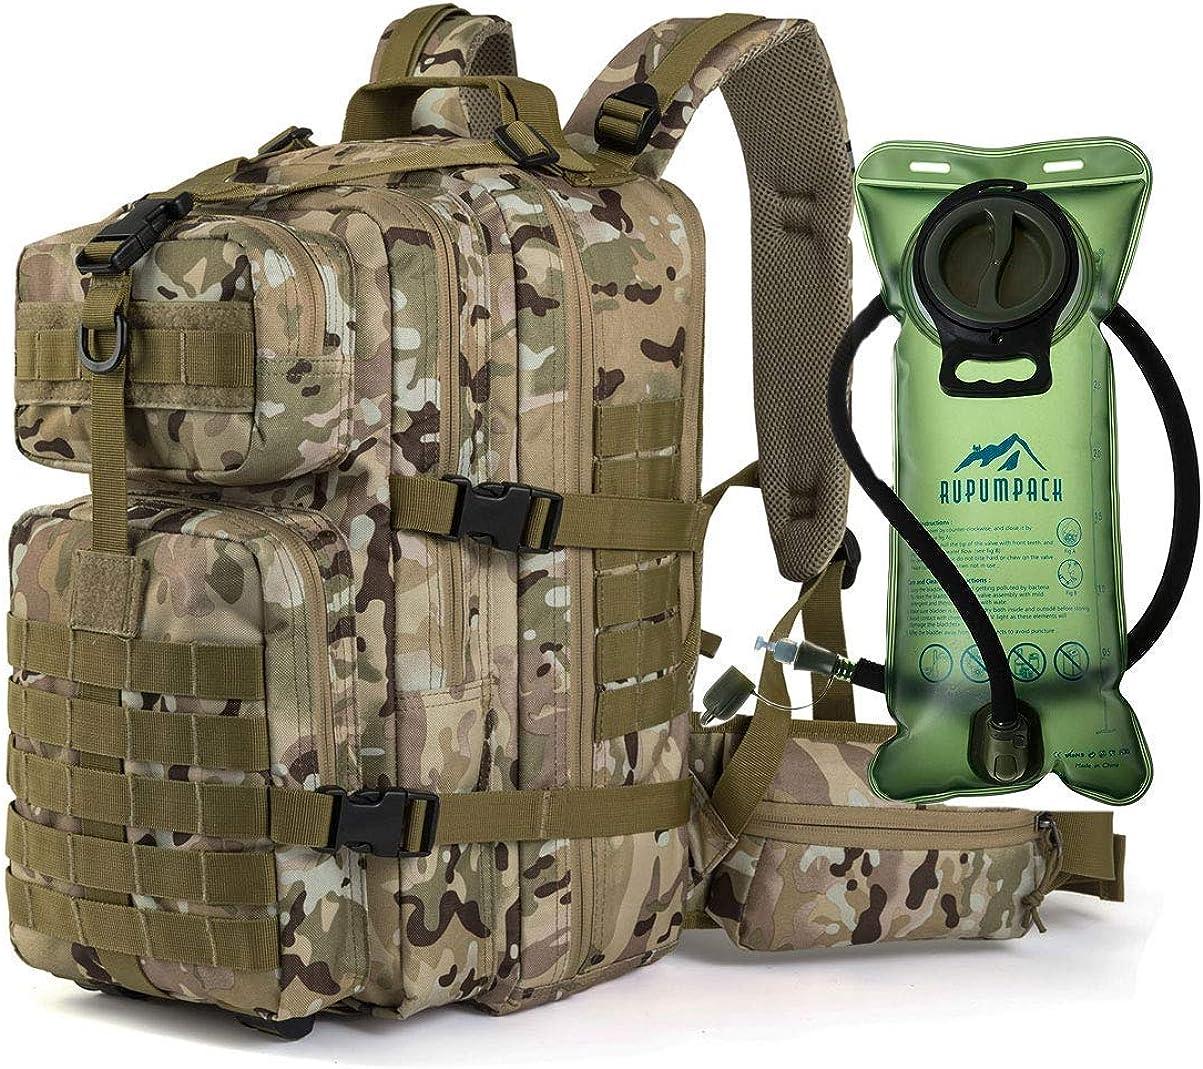 Under blast sales RUPUMPACK Military Tactical Genuine Backpack Hydration MO Army